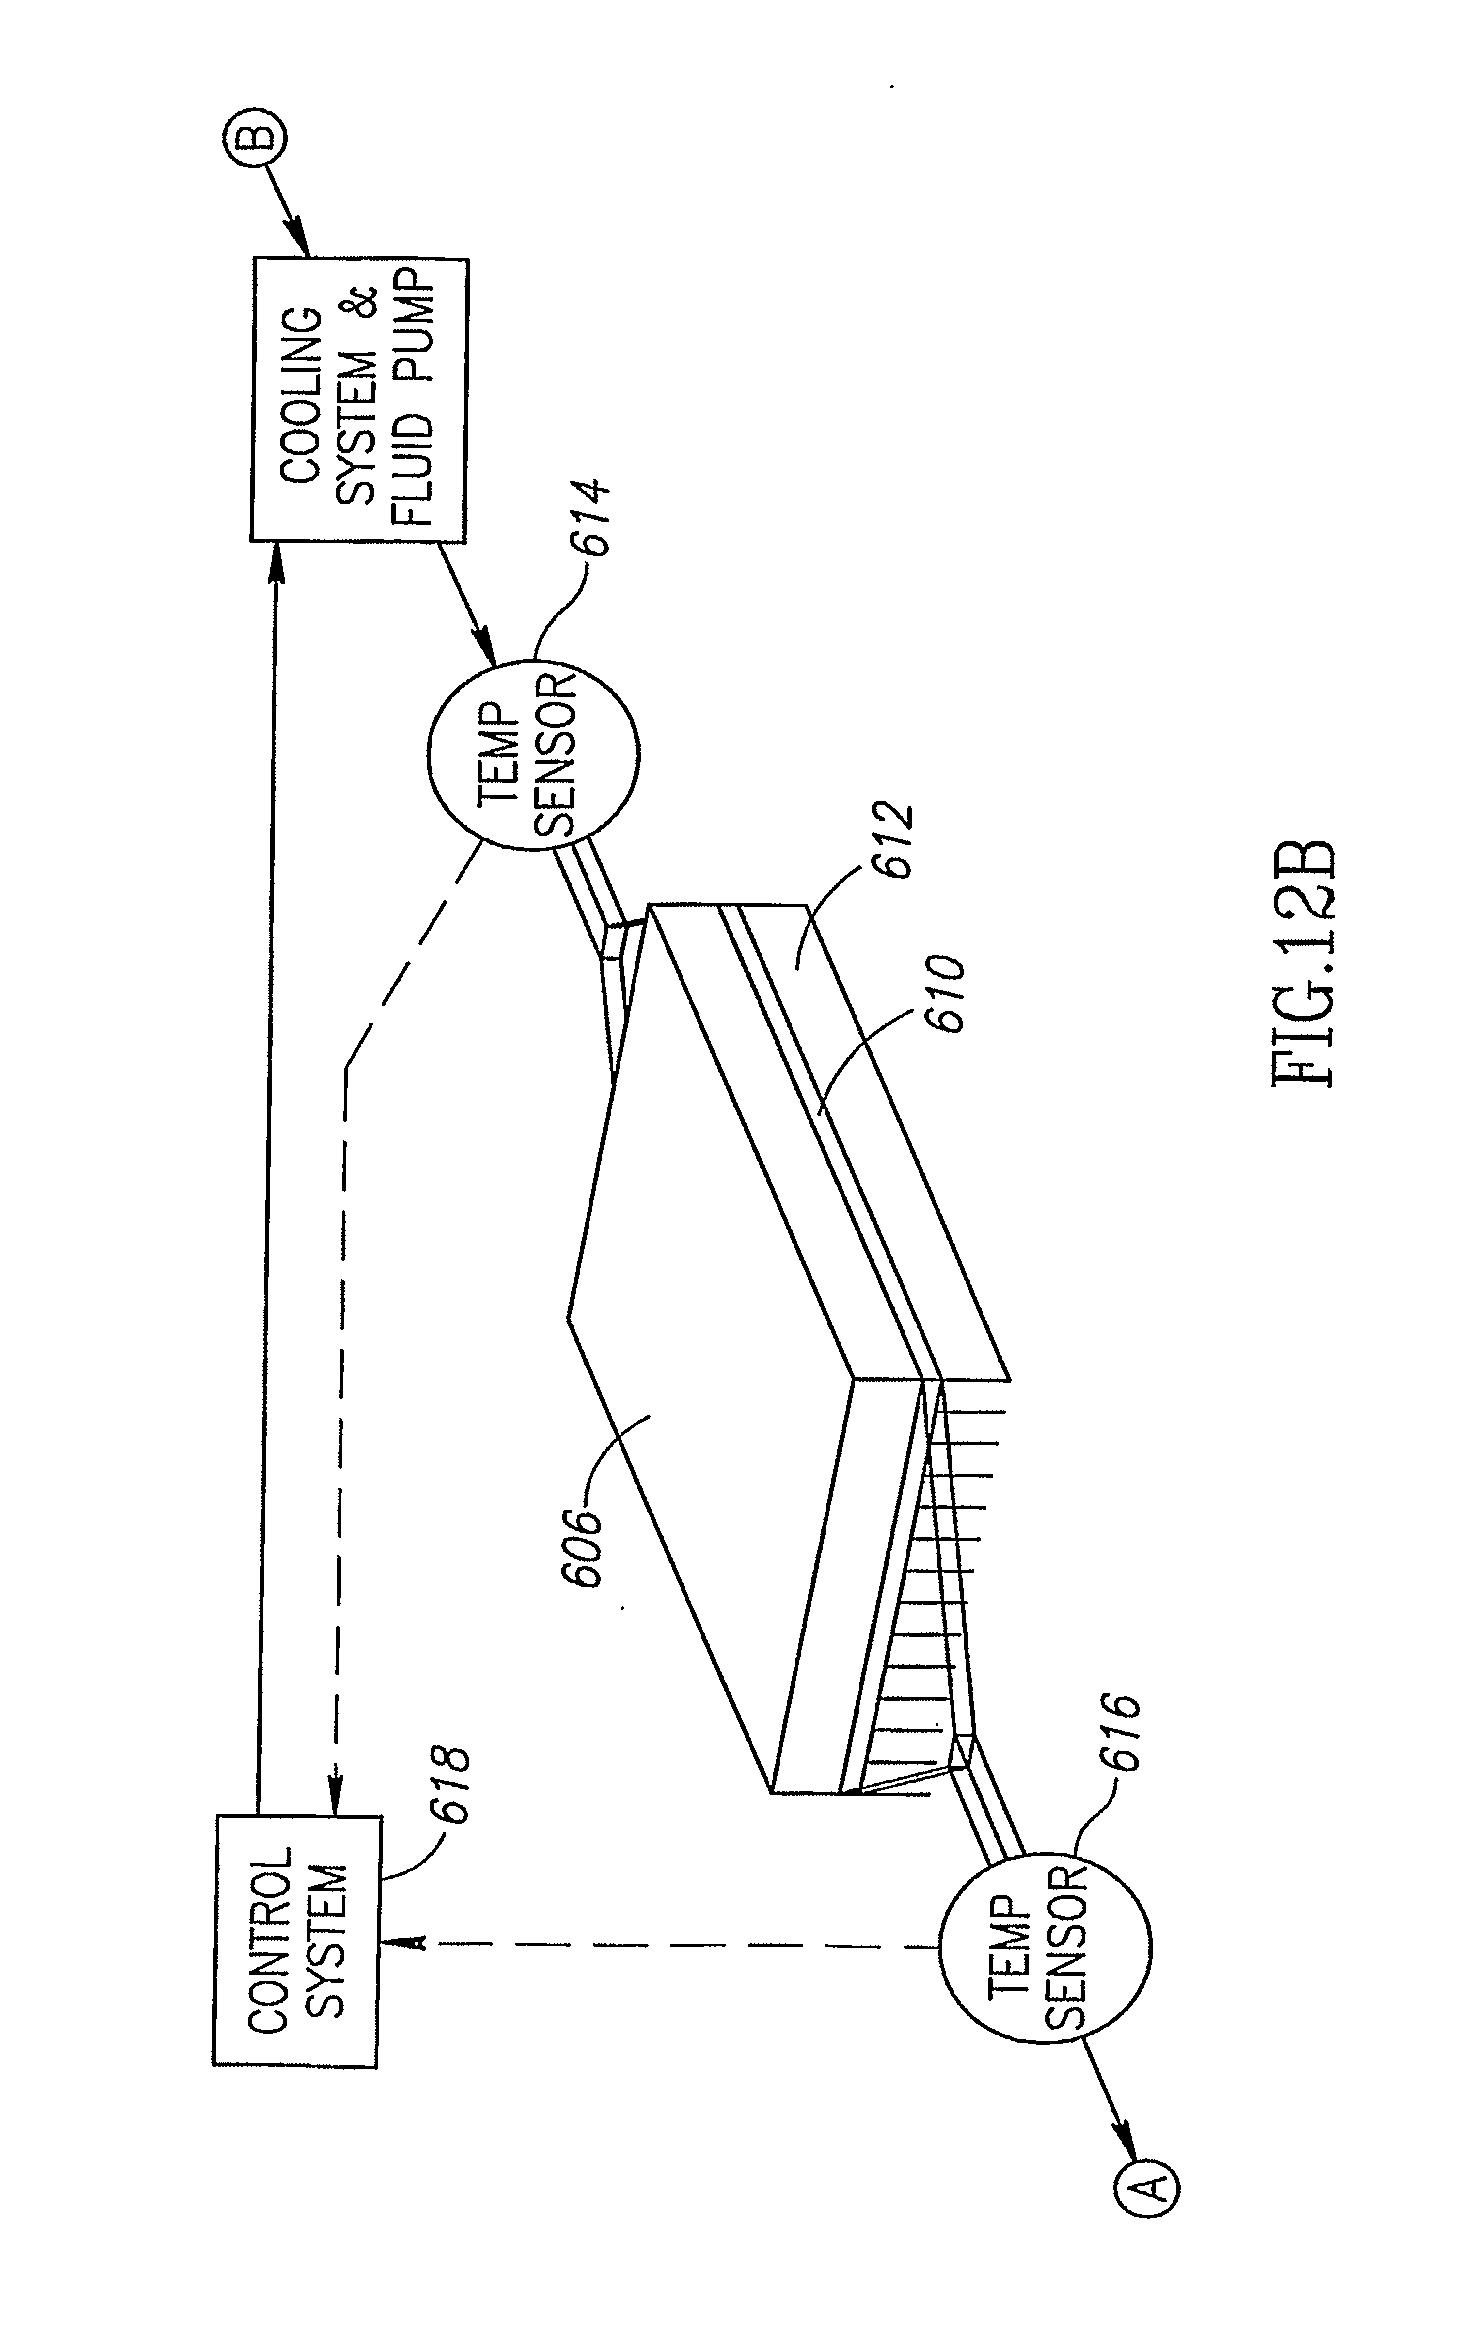 Gas Range Moreover Bosch Dishwasher Schematic Diagram On Ge Oven